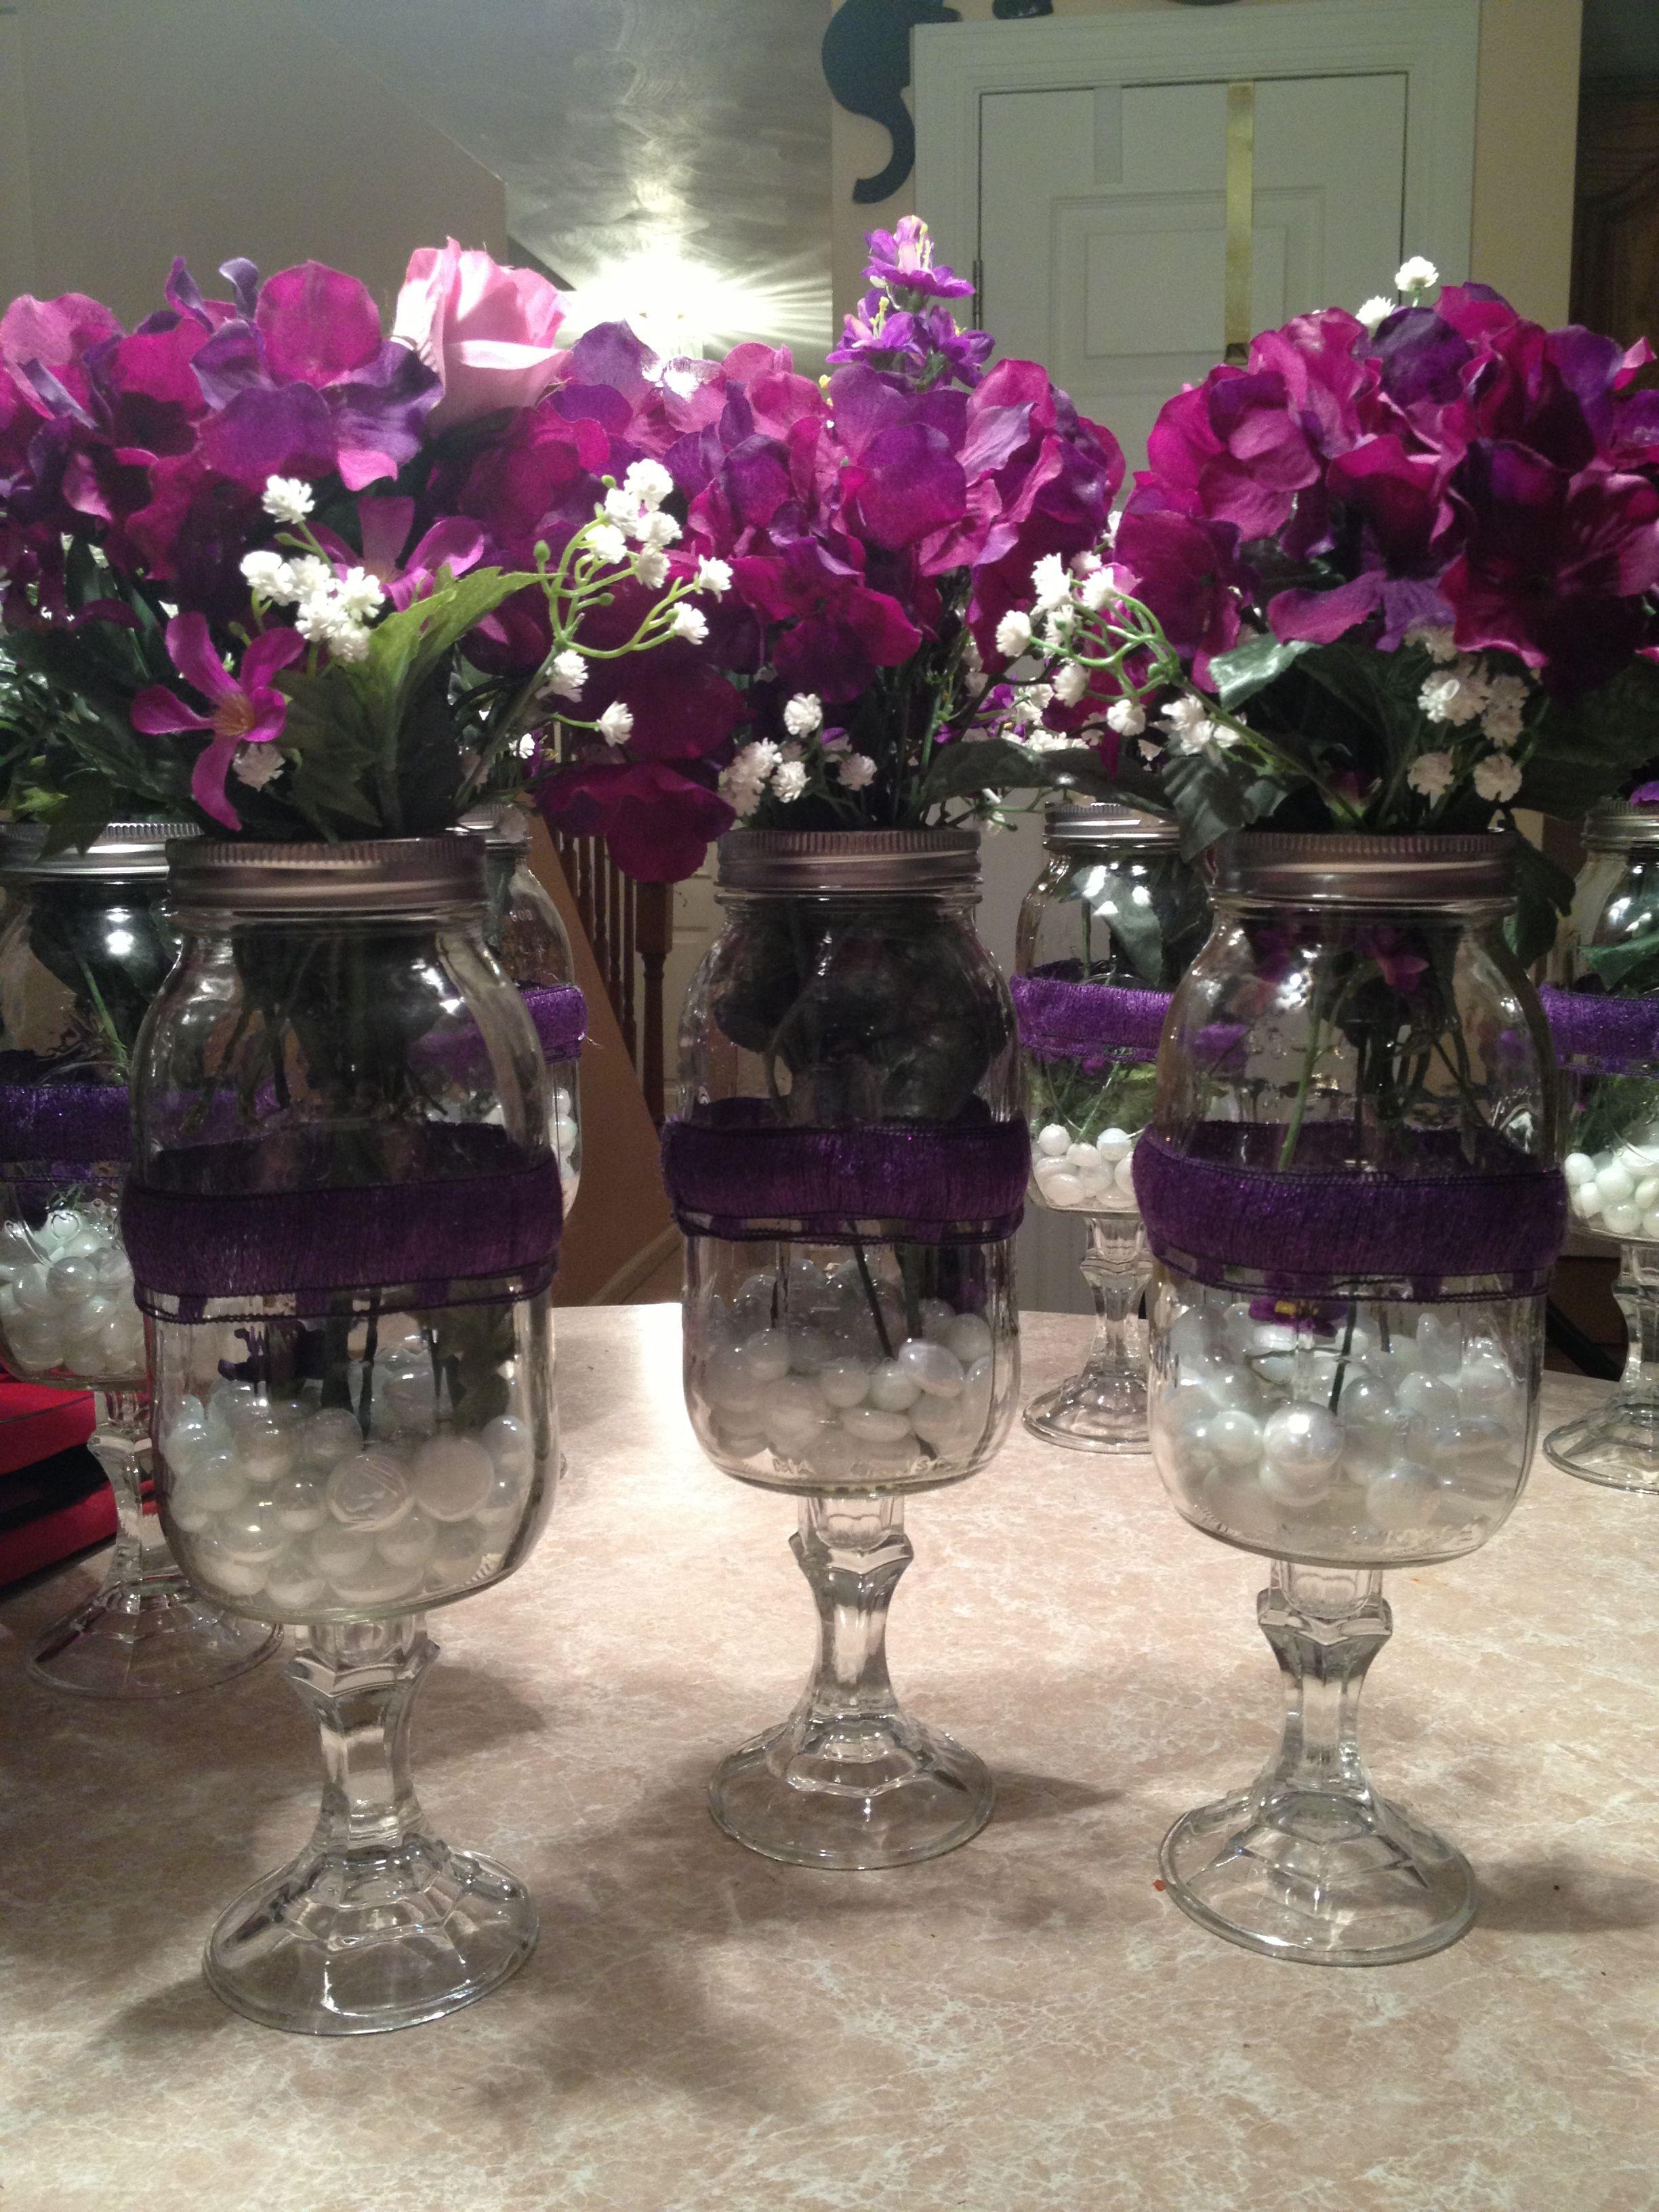 Quot Redneck Wine Glass Quot Flower Vases Centerpieces For My Cousin S Bridal Shower Use E6000 Glue